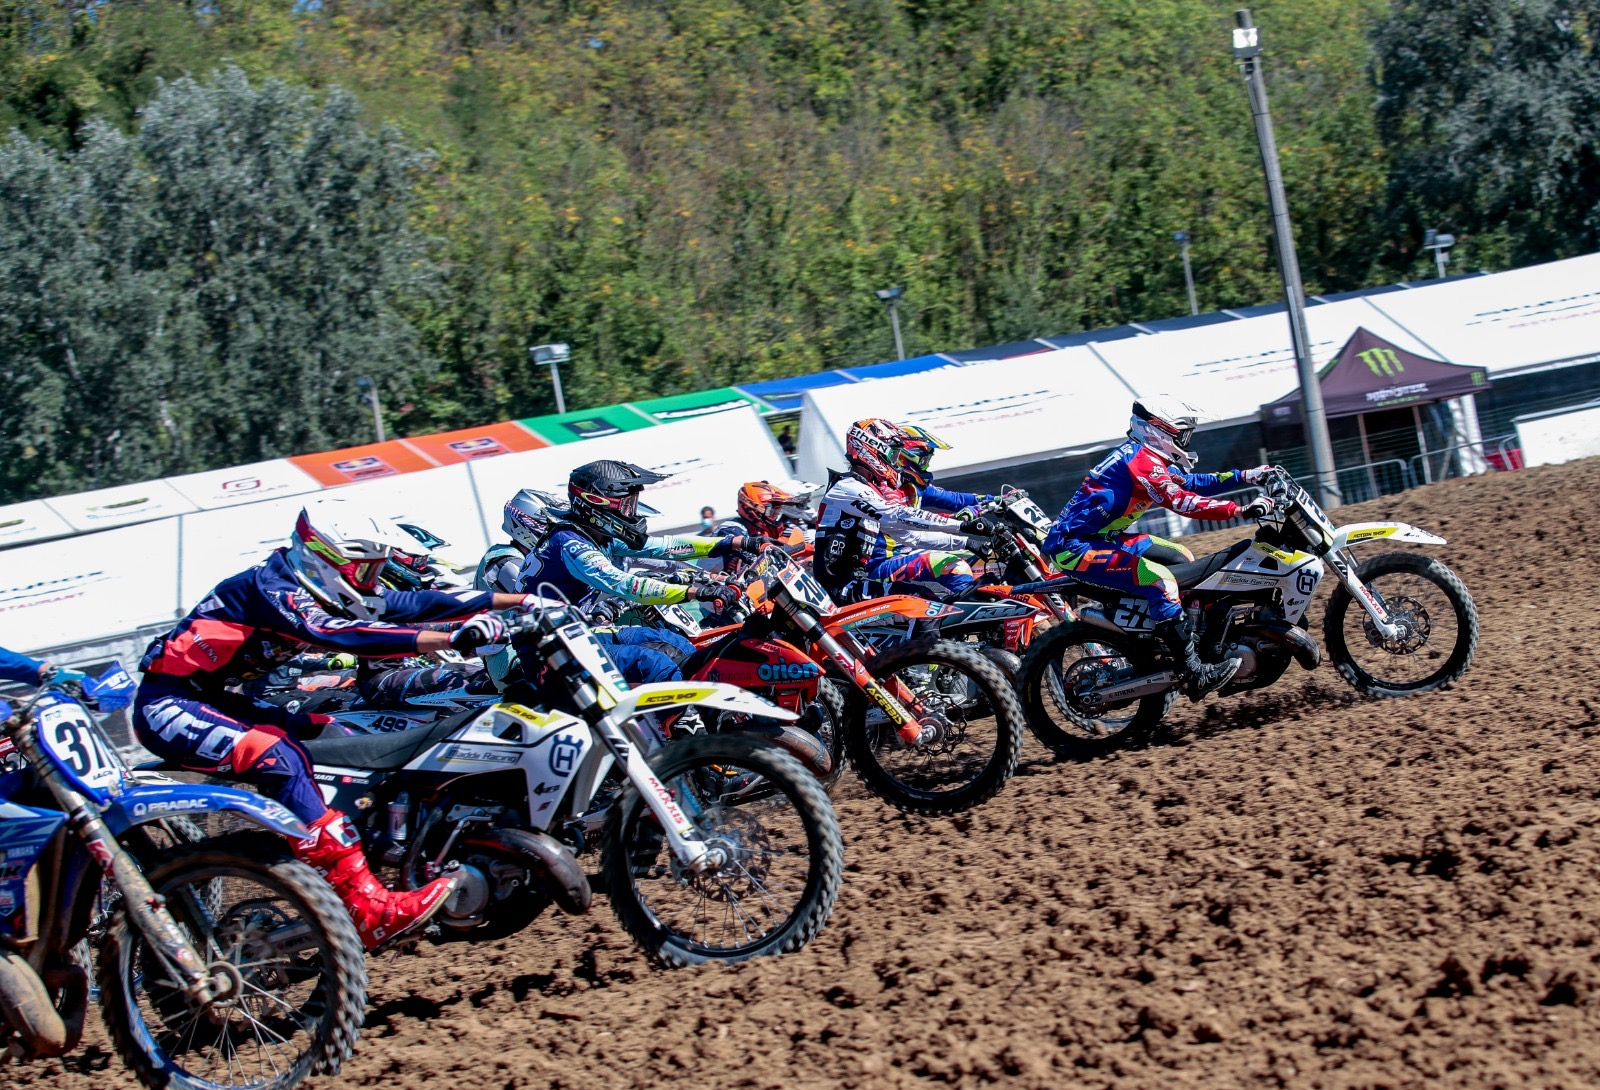 EMX250 2-stroke European Championship